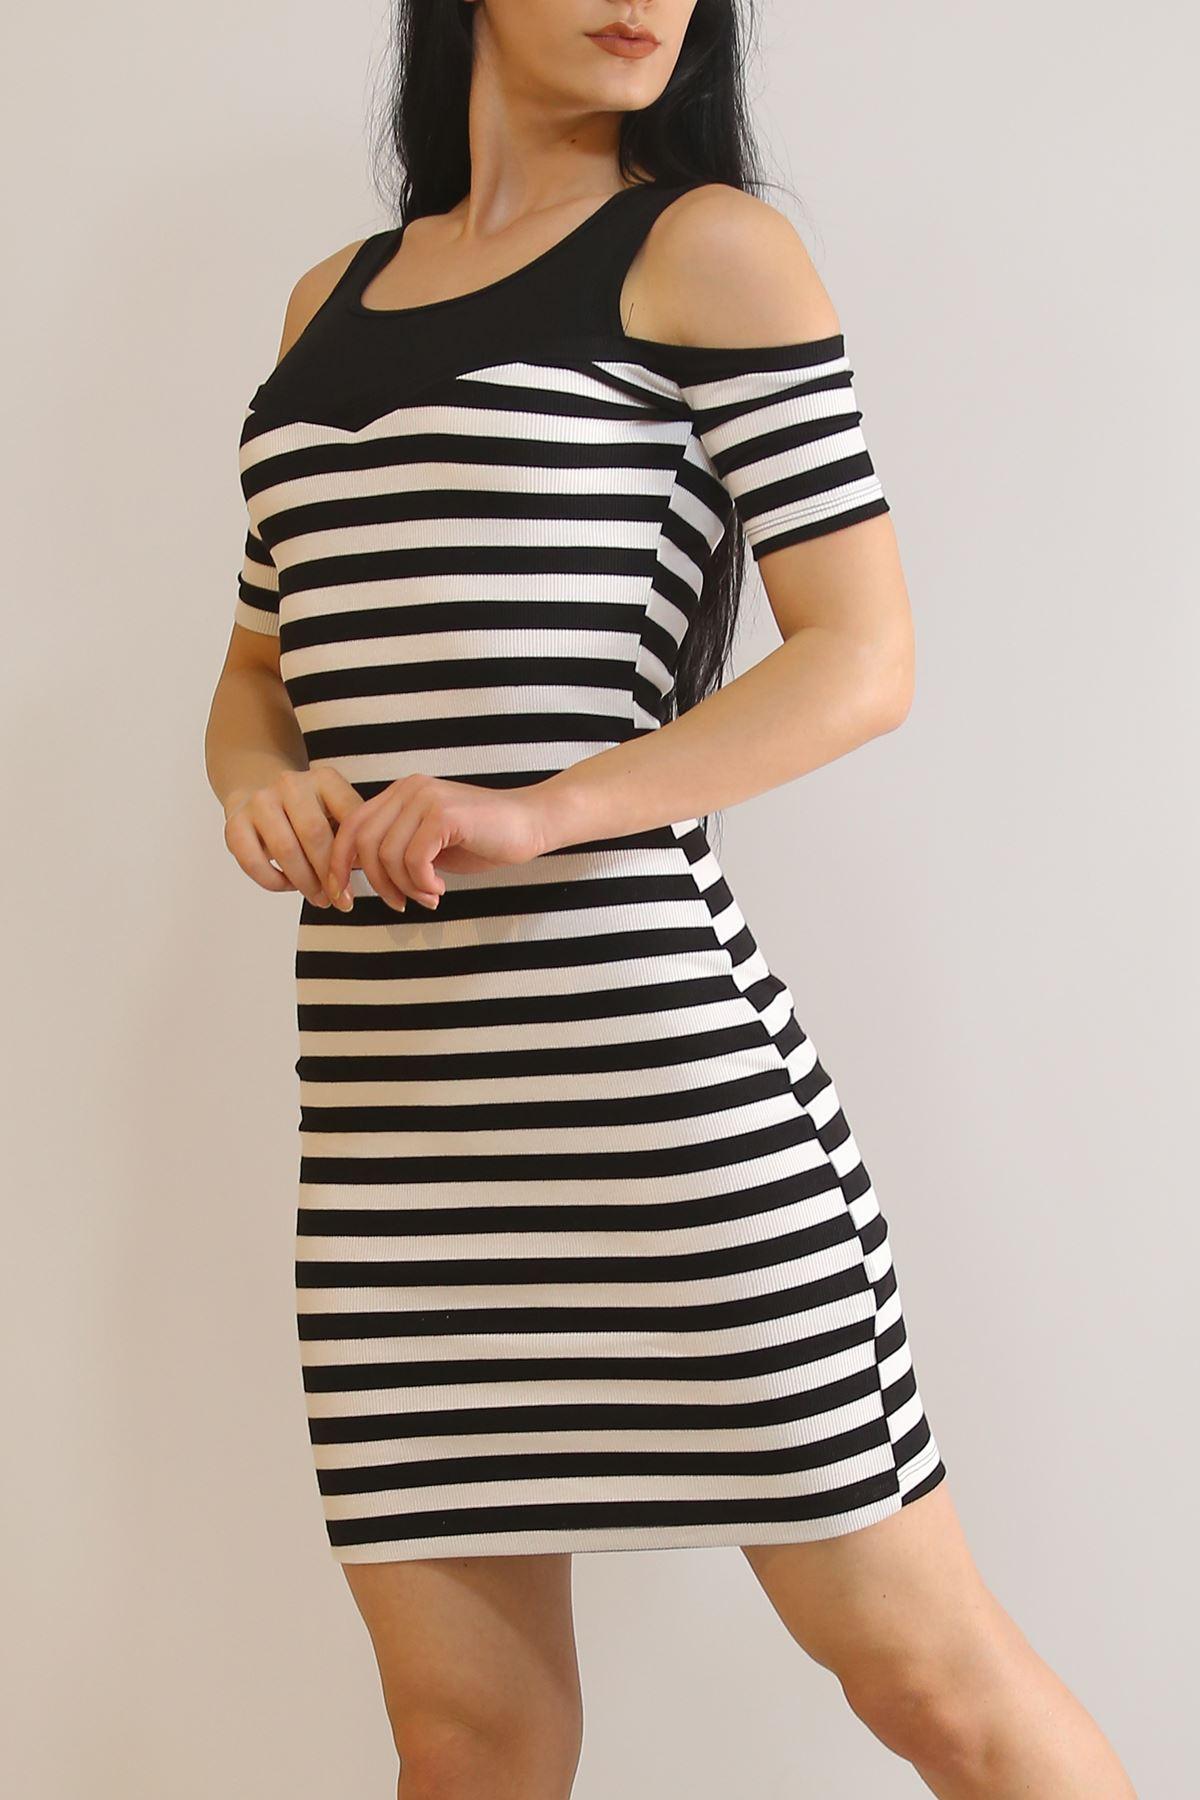 Çizgili Elbise Siyah - 3203.196.